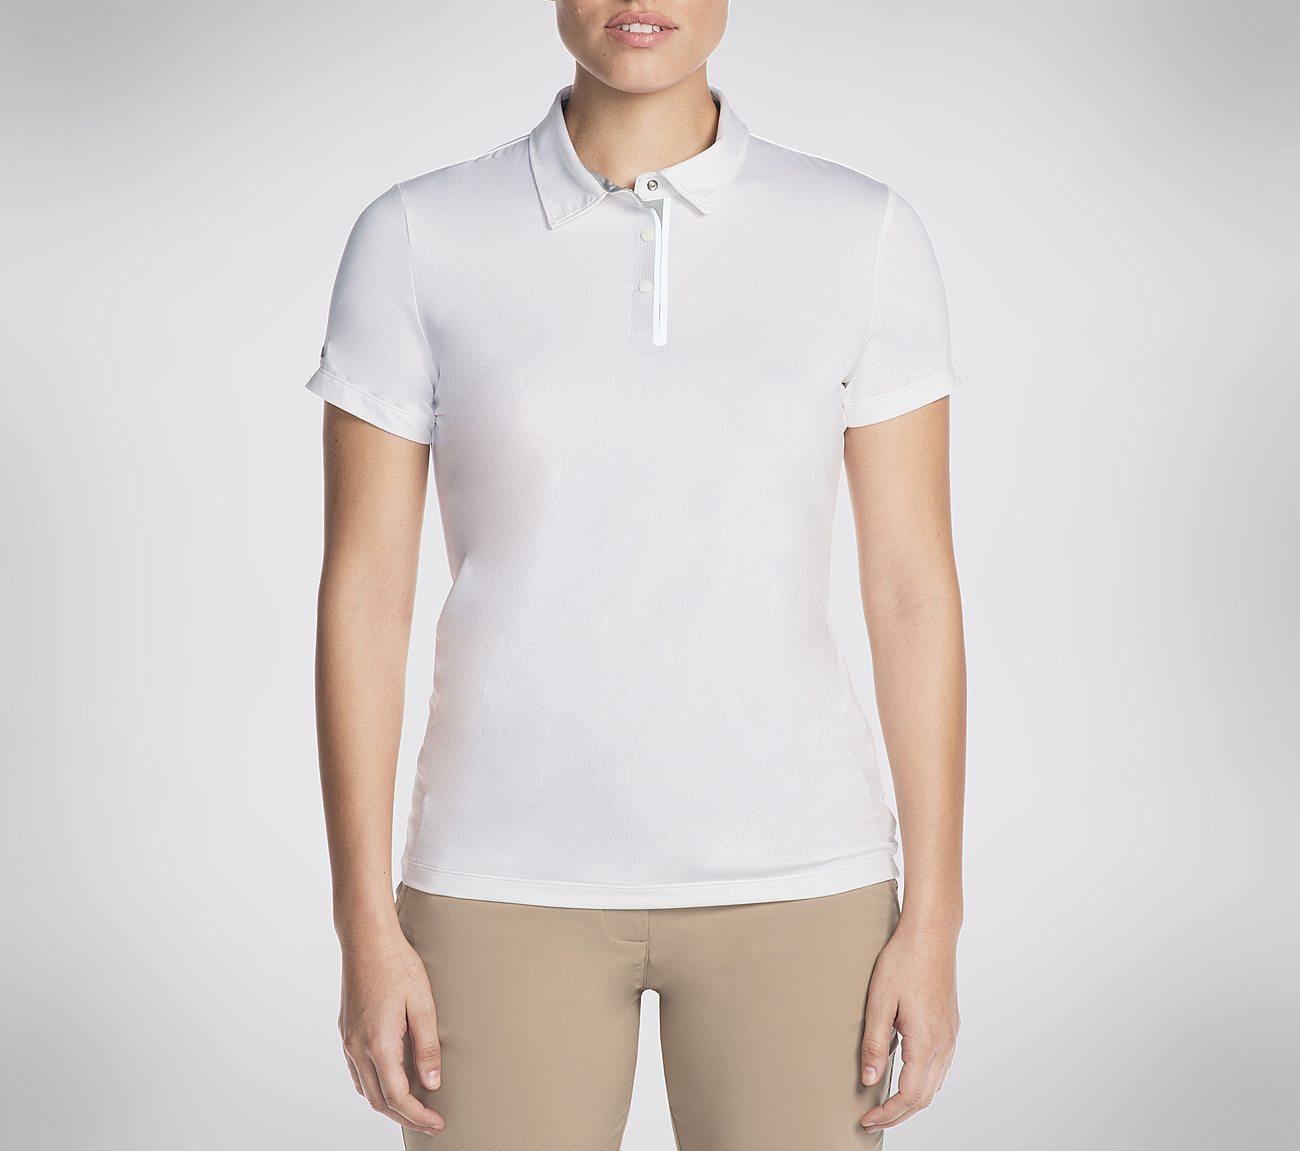 Skechers GO GOLF Pitch Short Sleeve Polo Shirt